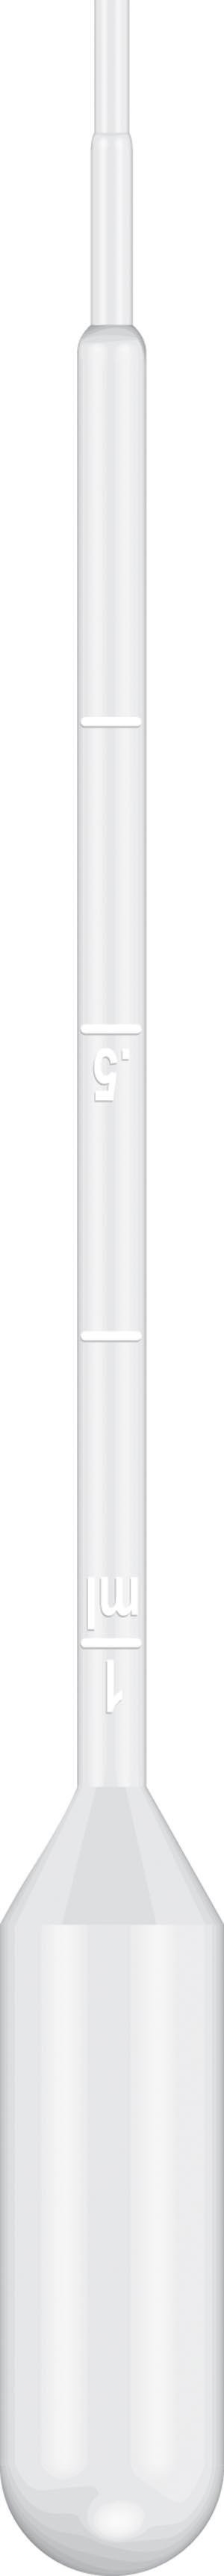 Graduated Pipet, 15cm Length, 5mL Capacity, Non-Sterile, 500/pk, 10 pk/cs